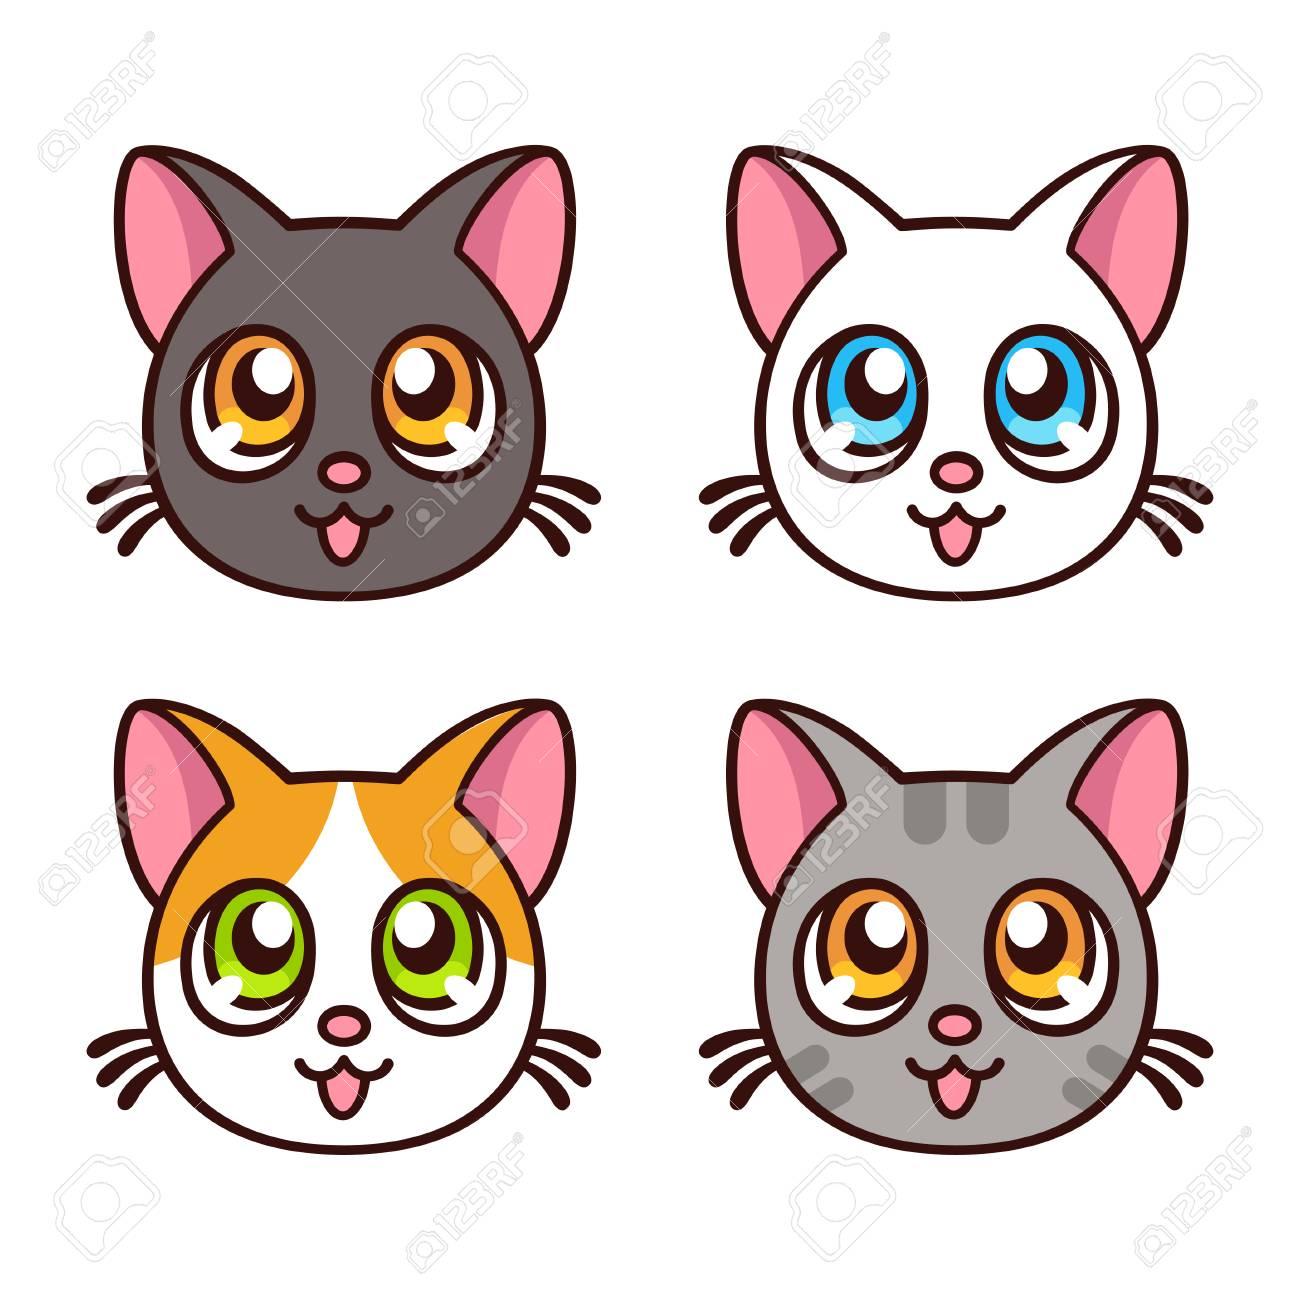 cute anime cat faces